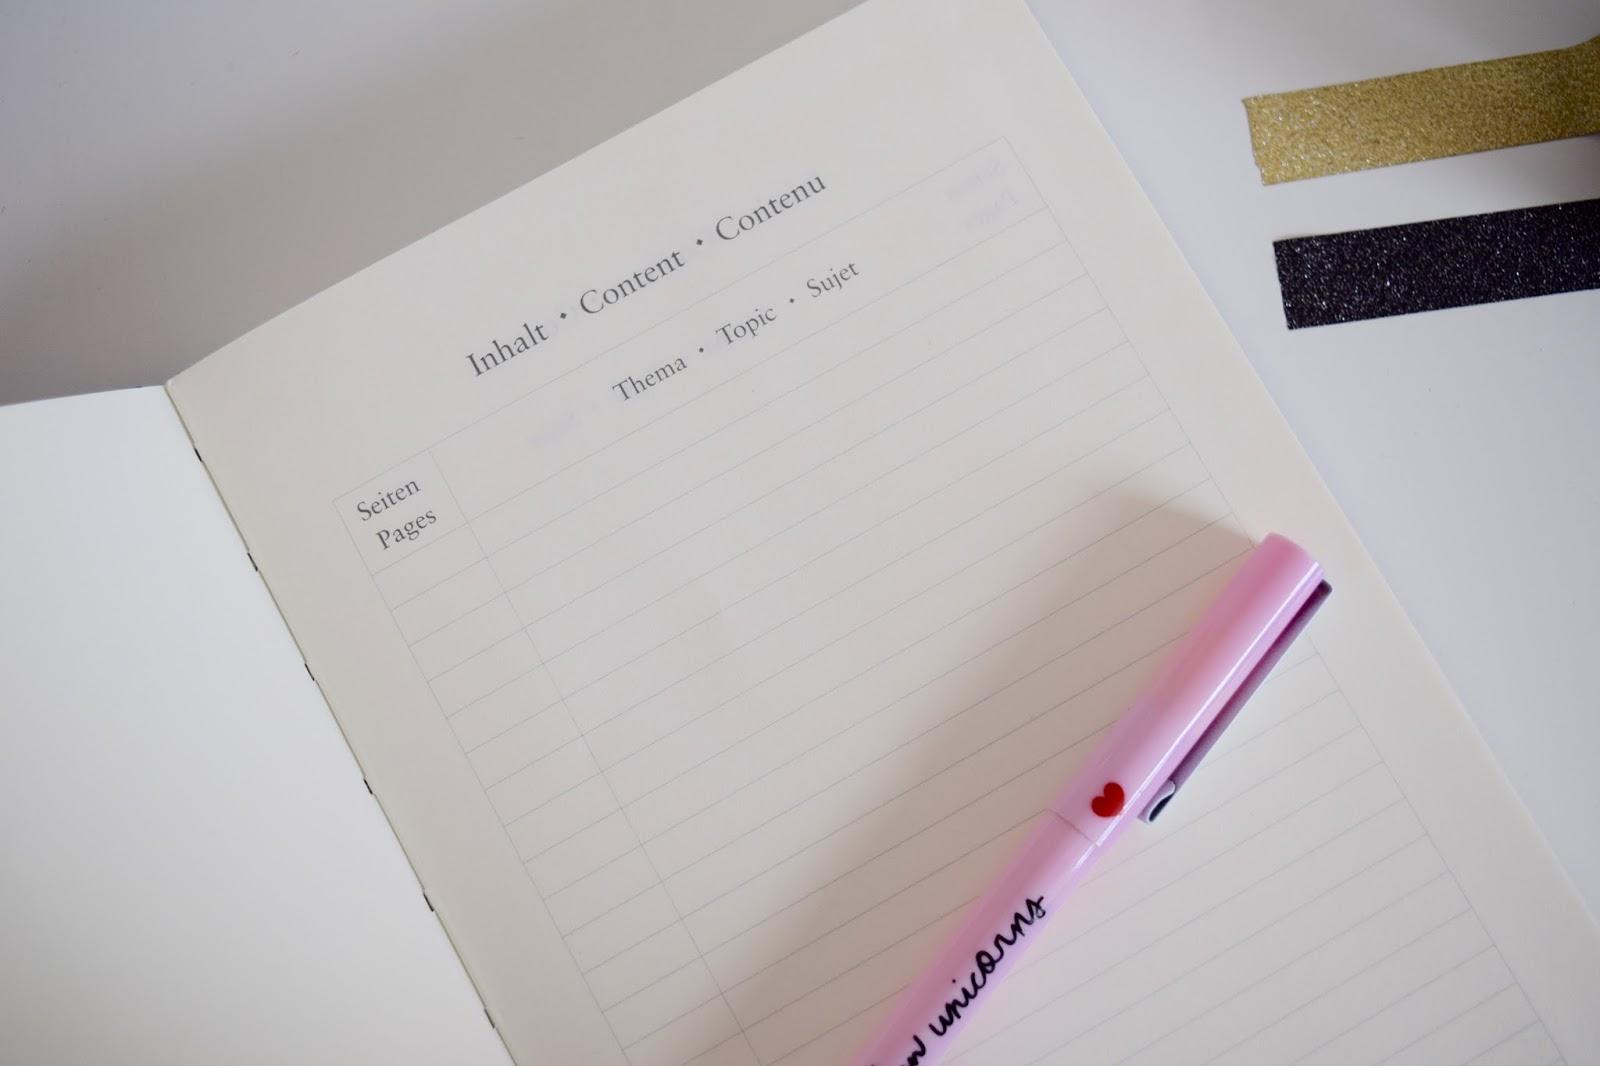 bullet journal dotted  Bullet Journal: Square Grid vs. Dot Grid | Adele Louise Smith